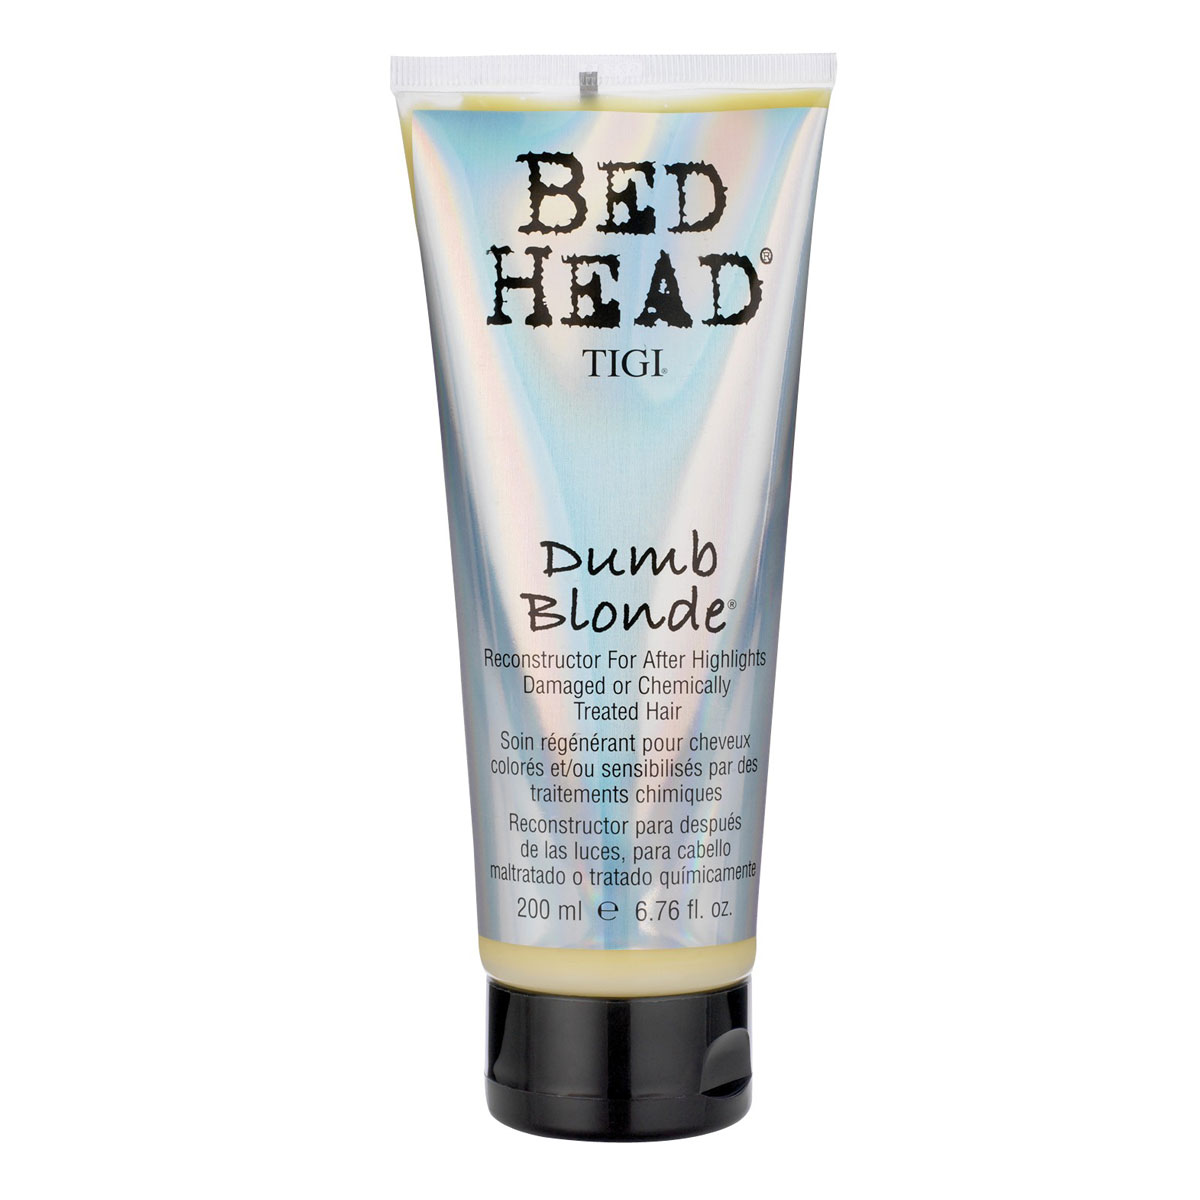 Tigi Bed Head Dumb Blonde Reconstructor Hair Serum 200ml Enlarged Preview